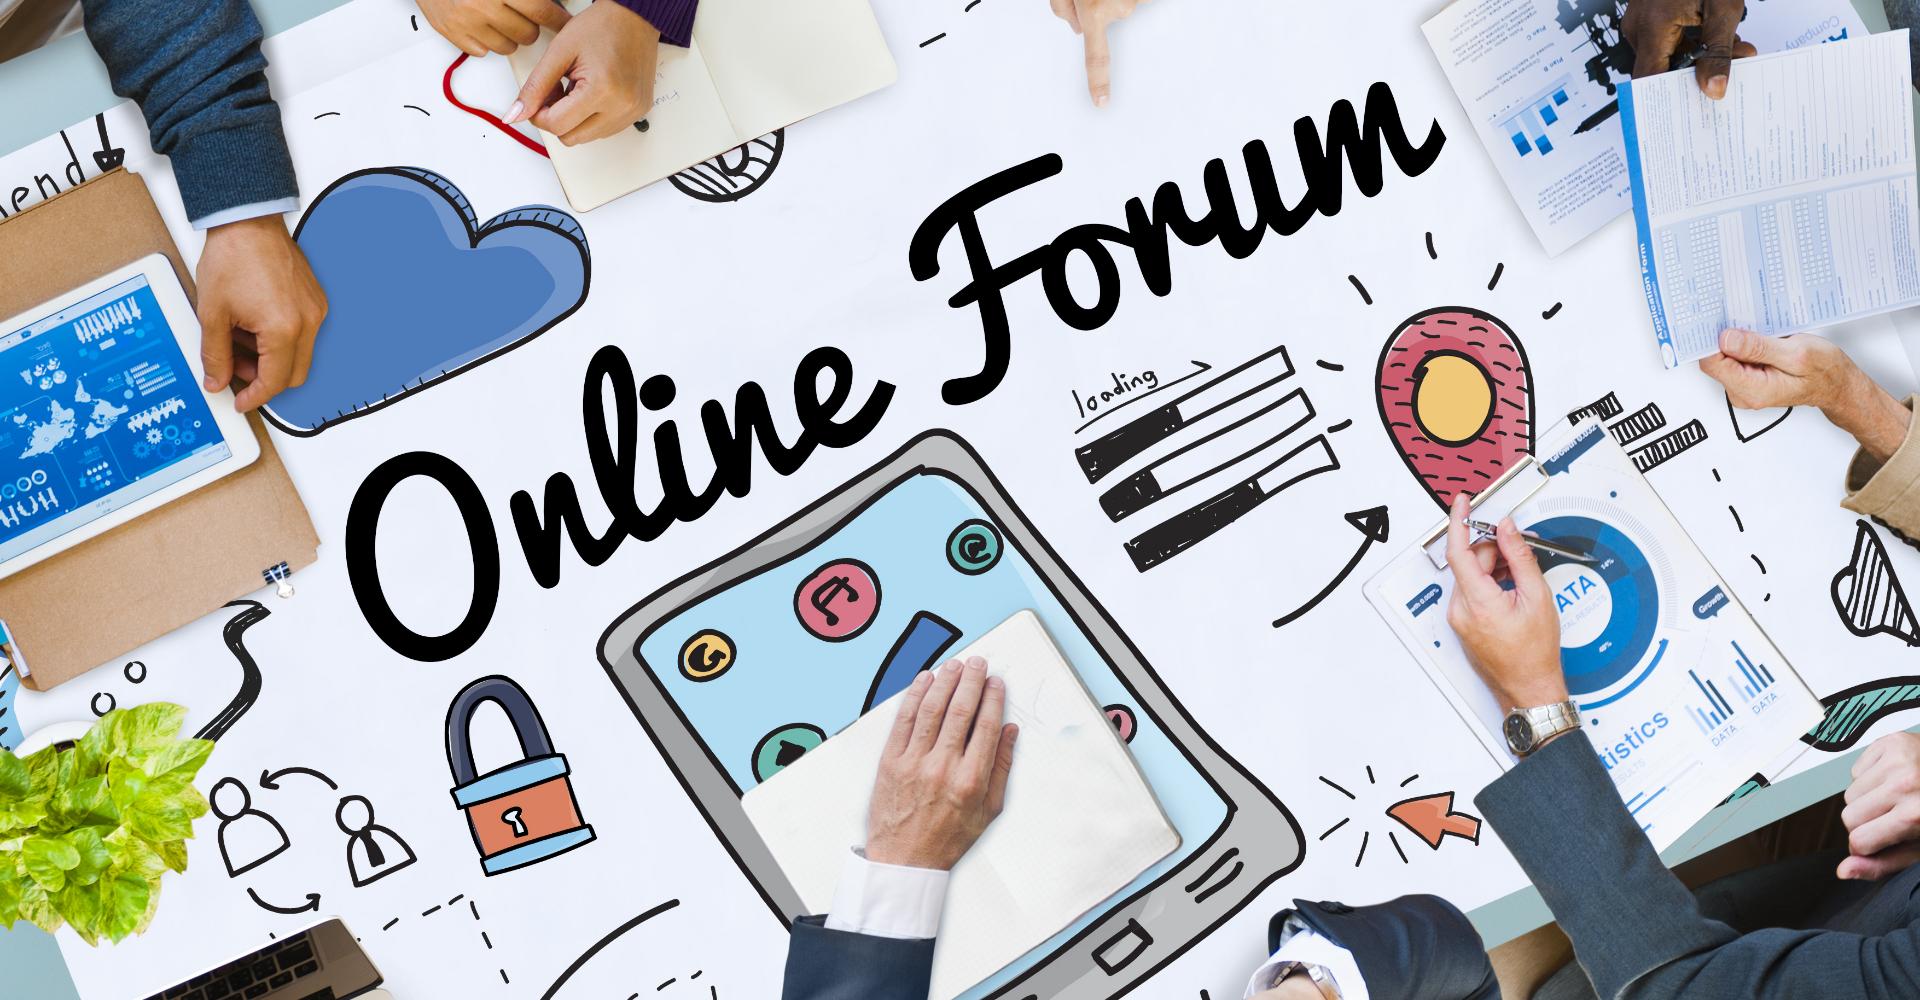 Gietvloer forum